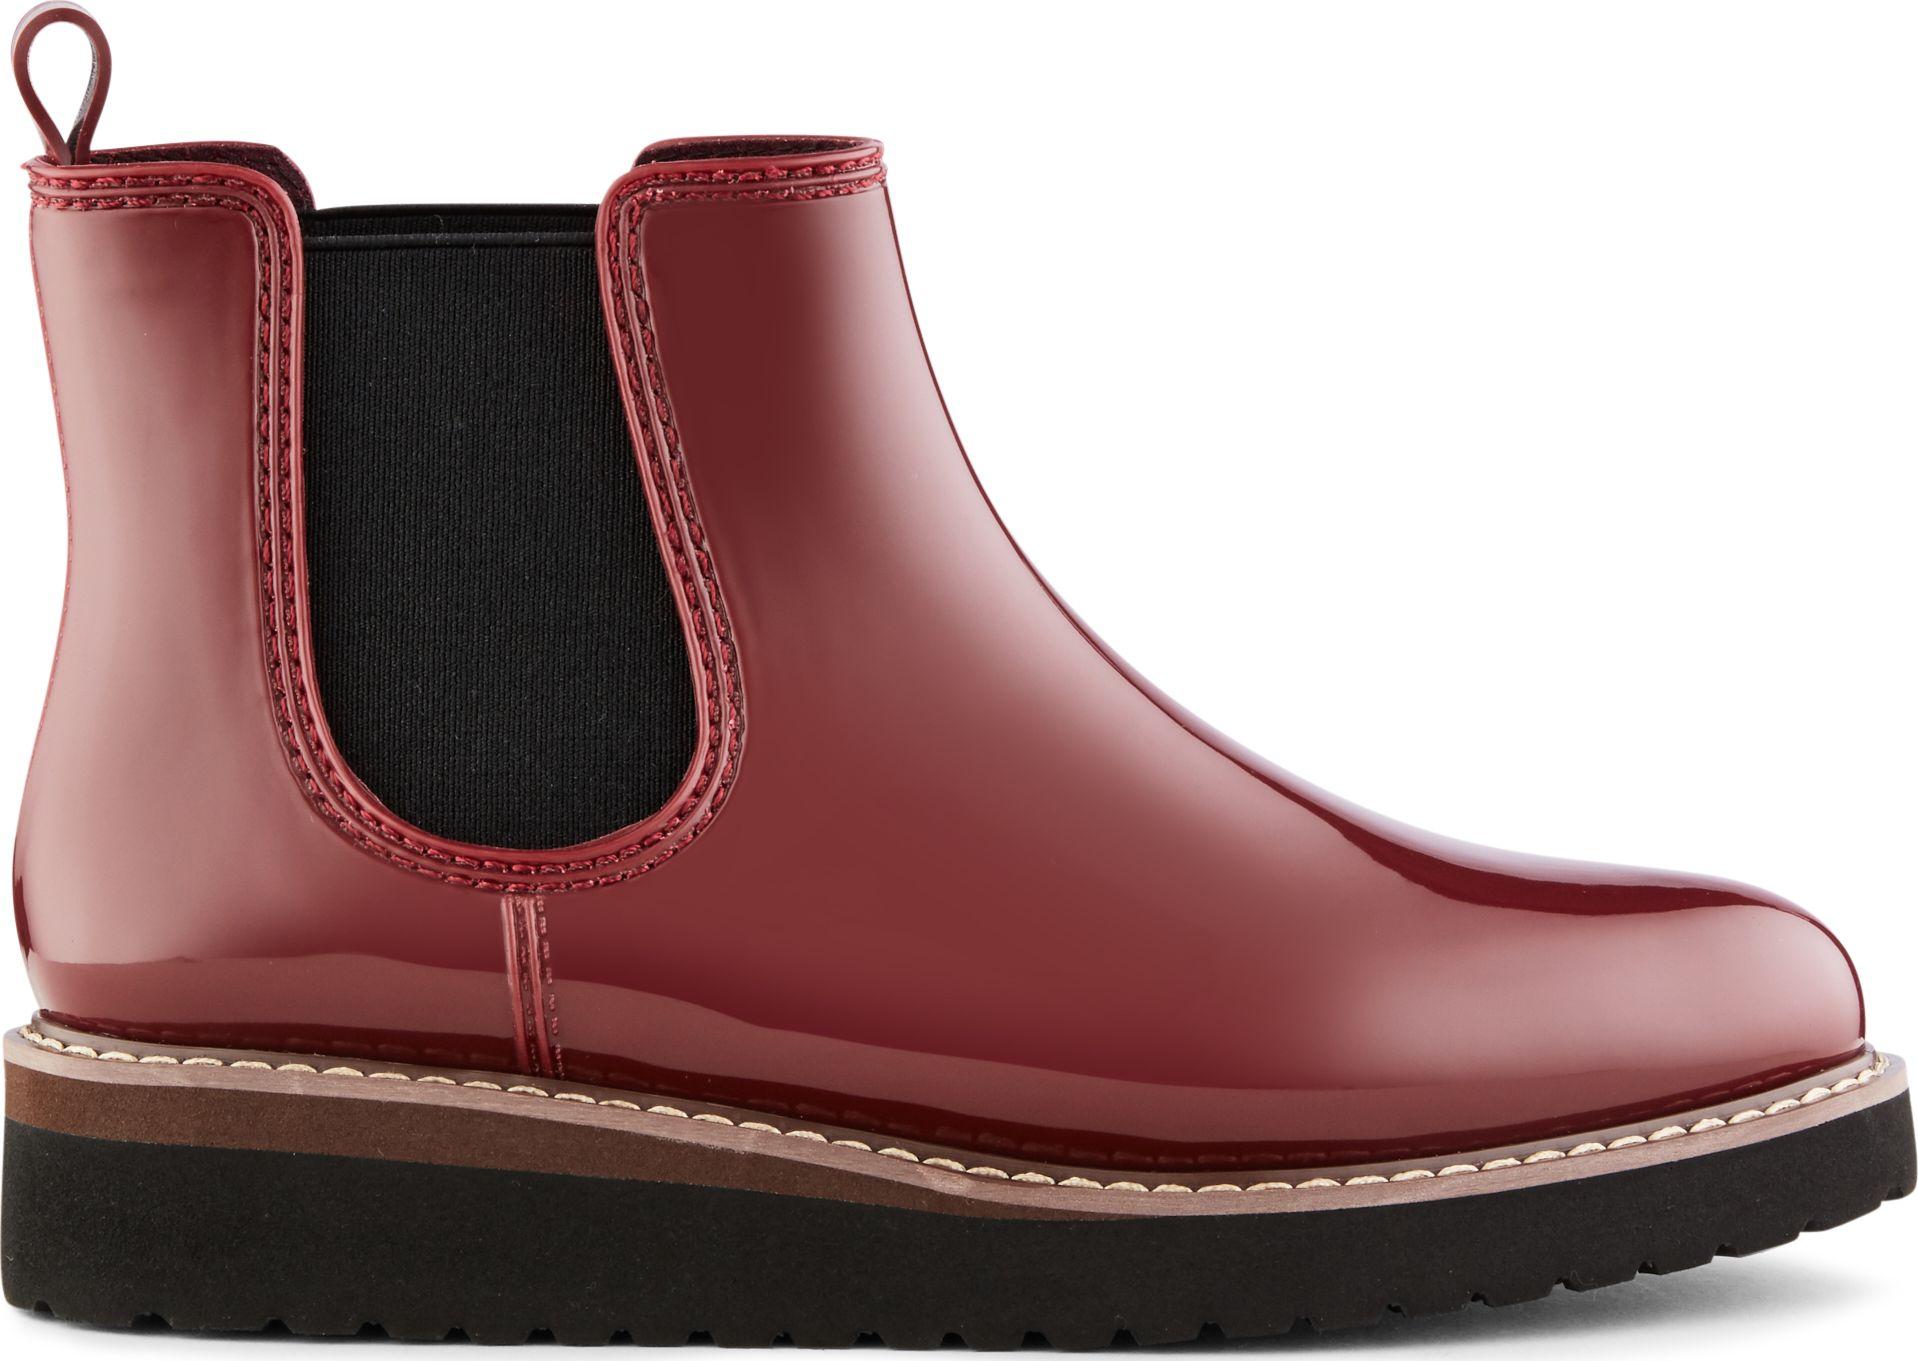 COUGAR Kensington Gloss Crimson 41